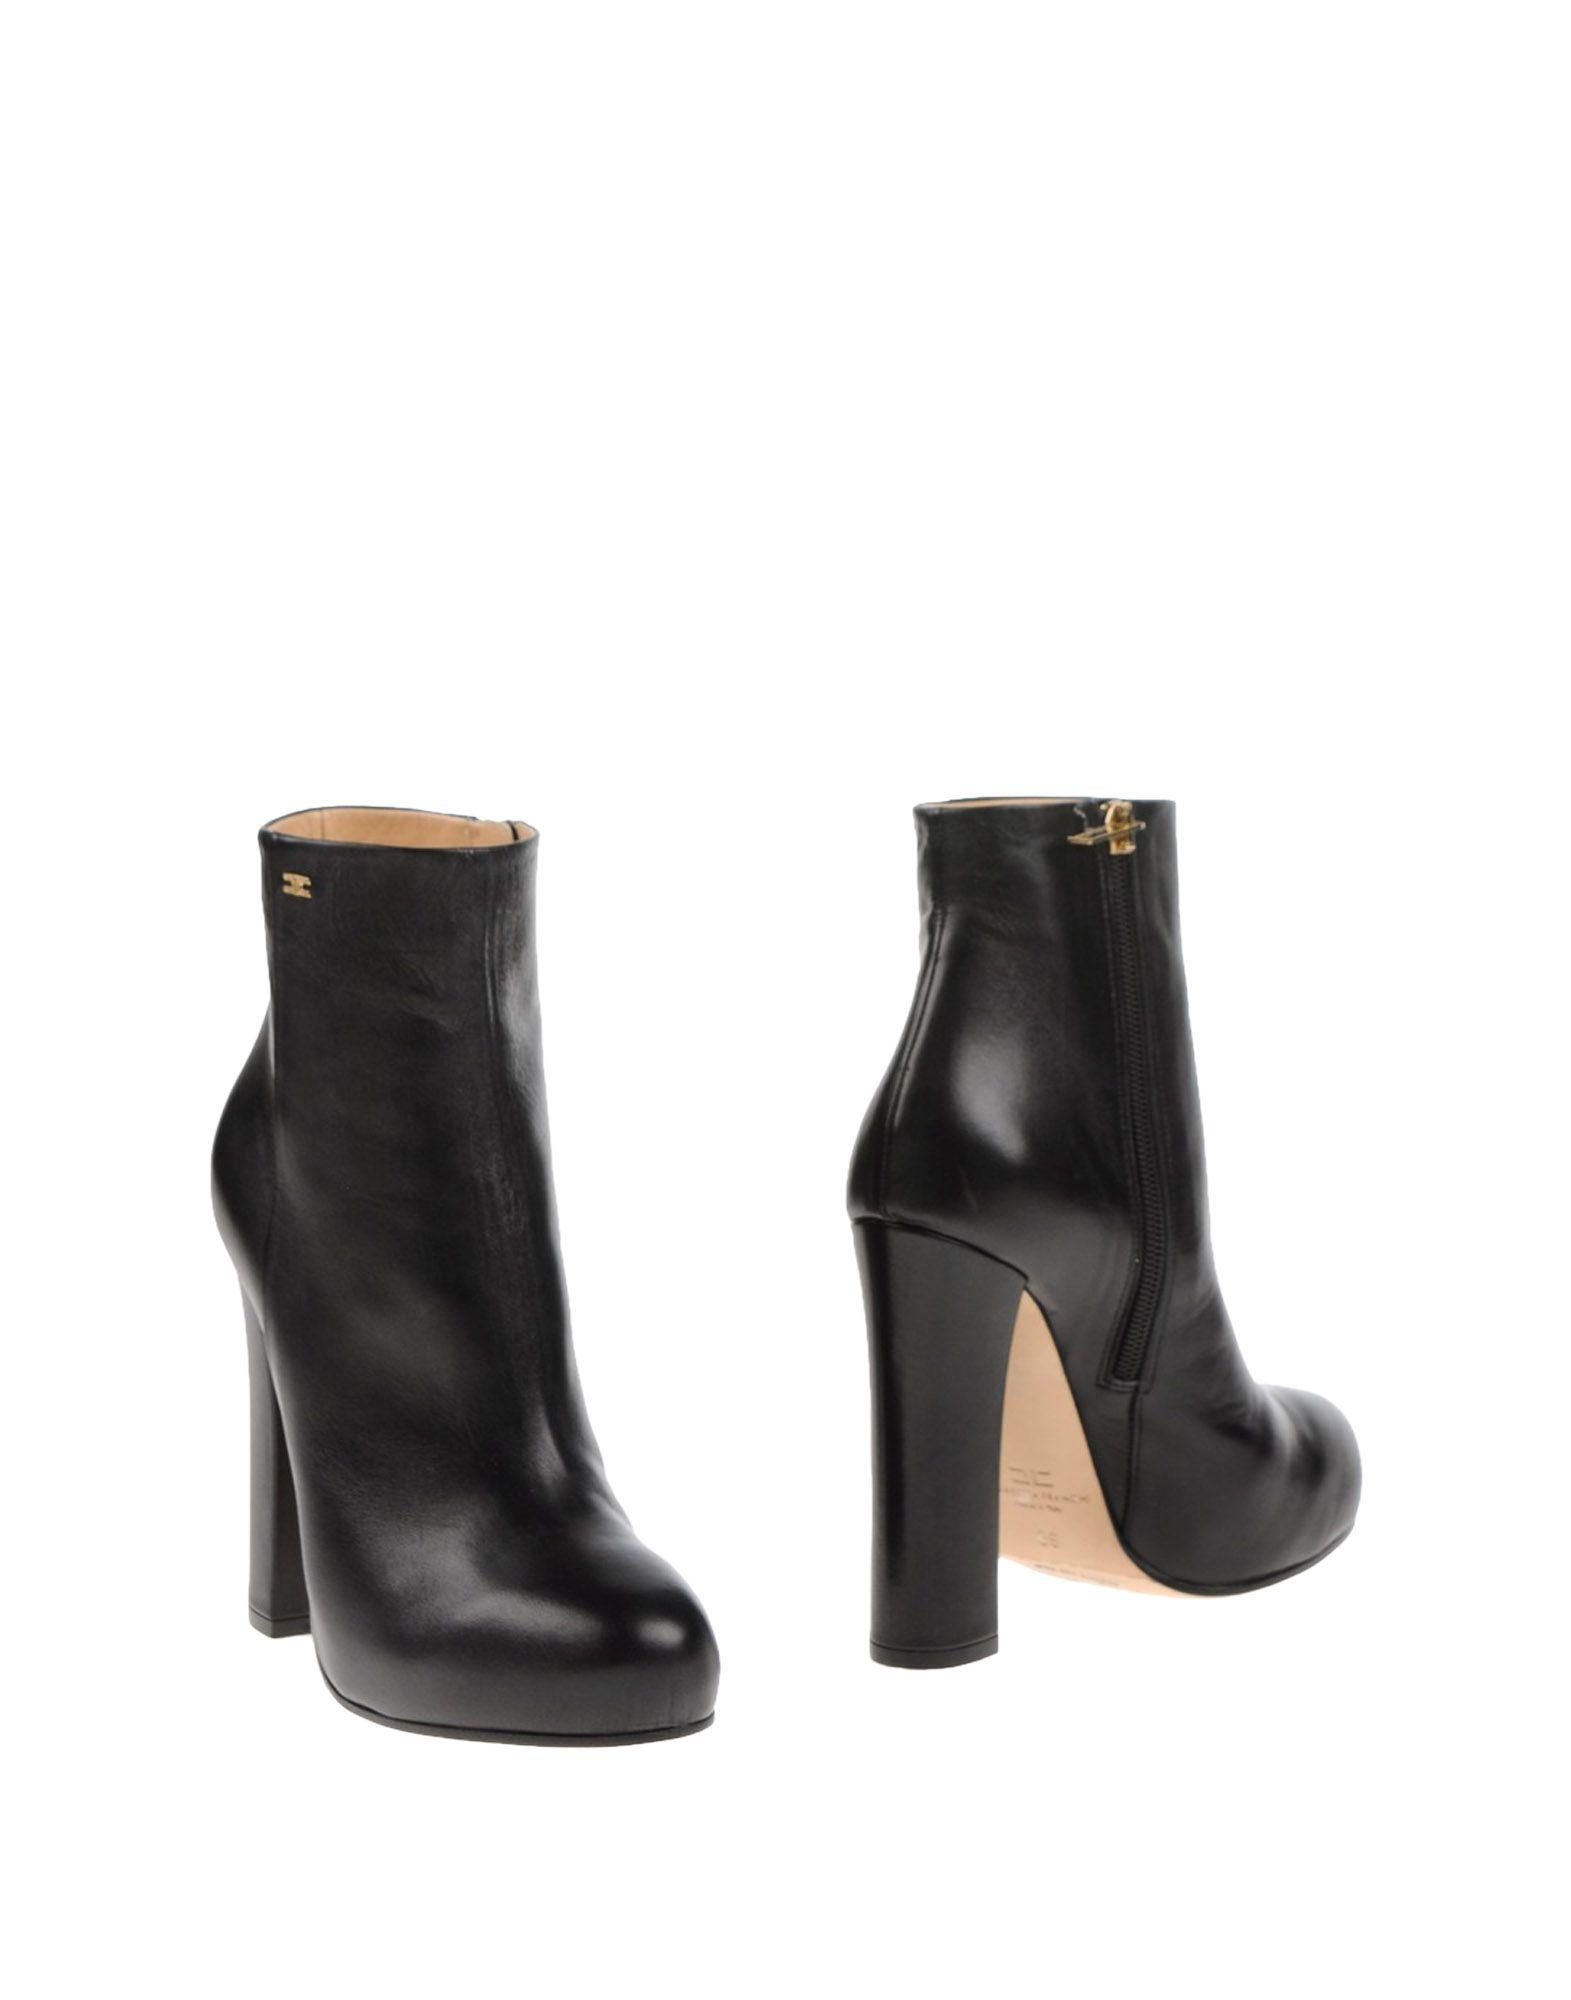 Rabatt Schuhe Stiefelette Elisabetta Franchi Stiefelette Schuhe Damen  11244617VE 0476db